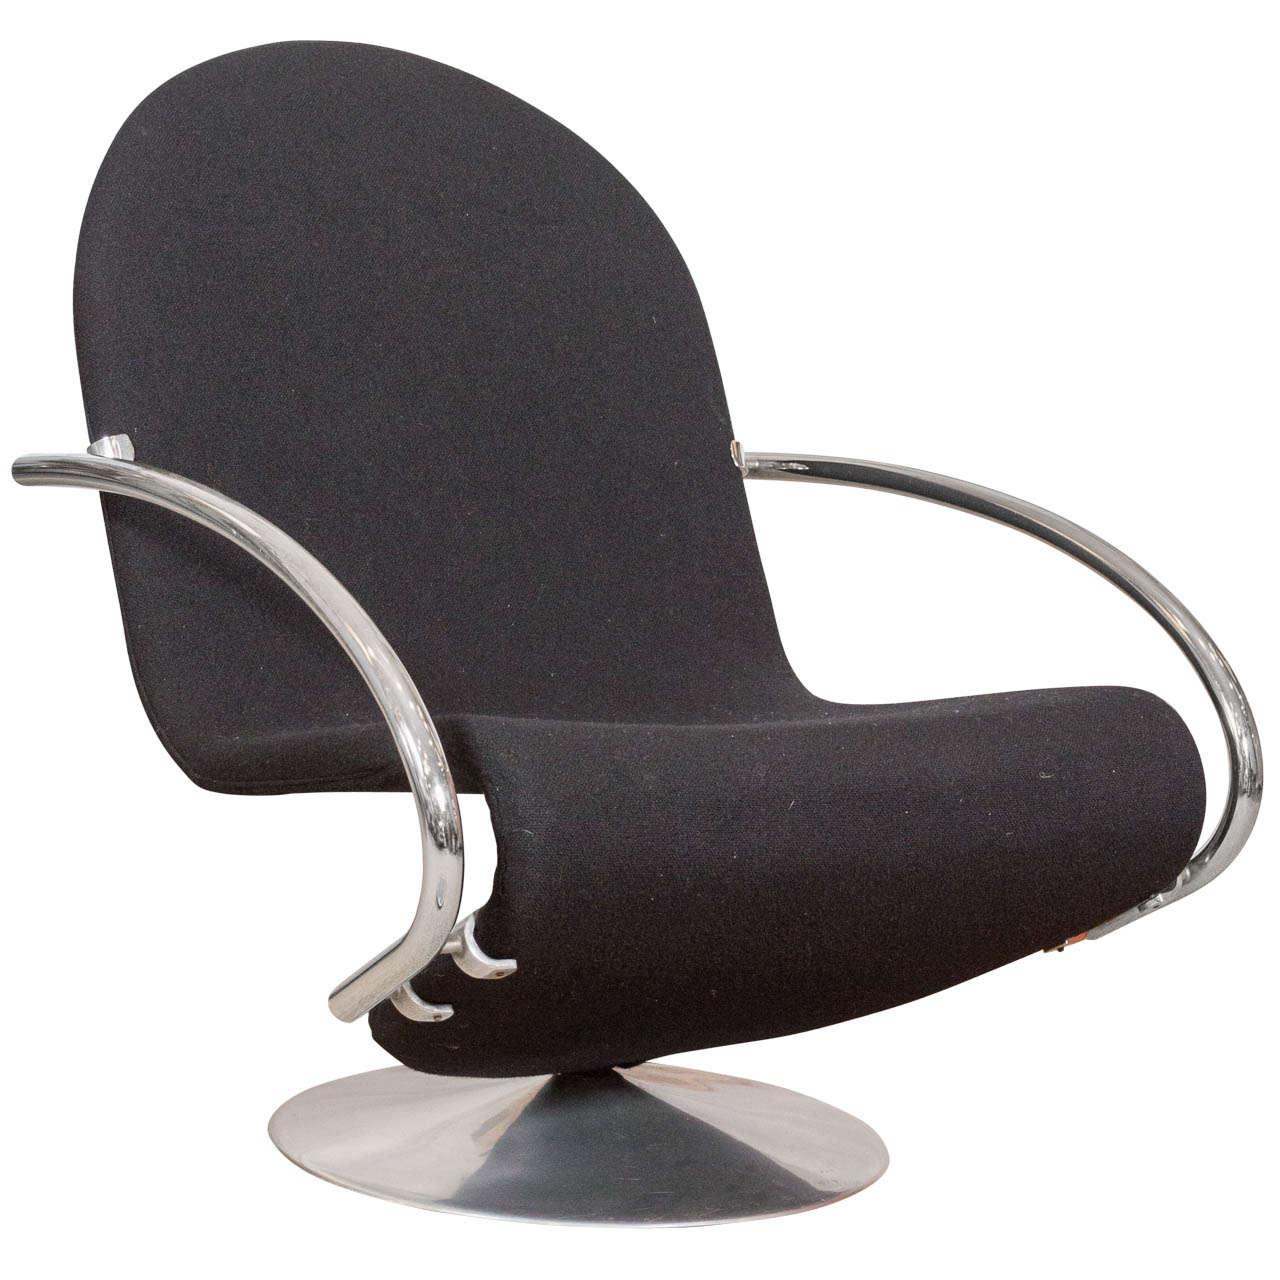 verner panton chair panton s chairs 600x301 verner panton dining chair panton chair design. Black Bedroom Furniture Sets. Home Design Ideas